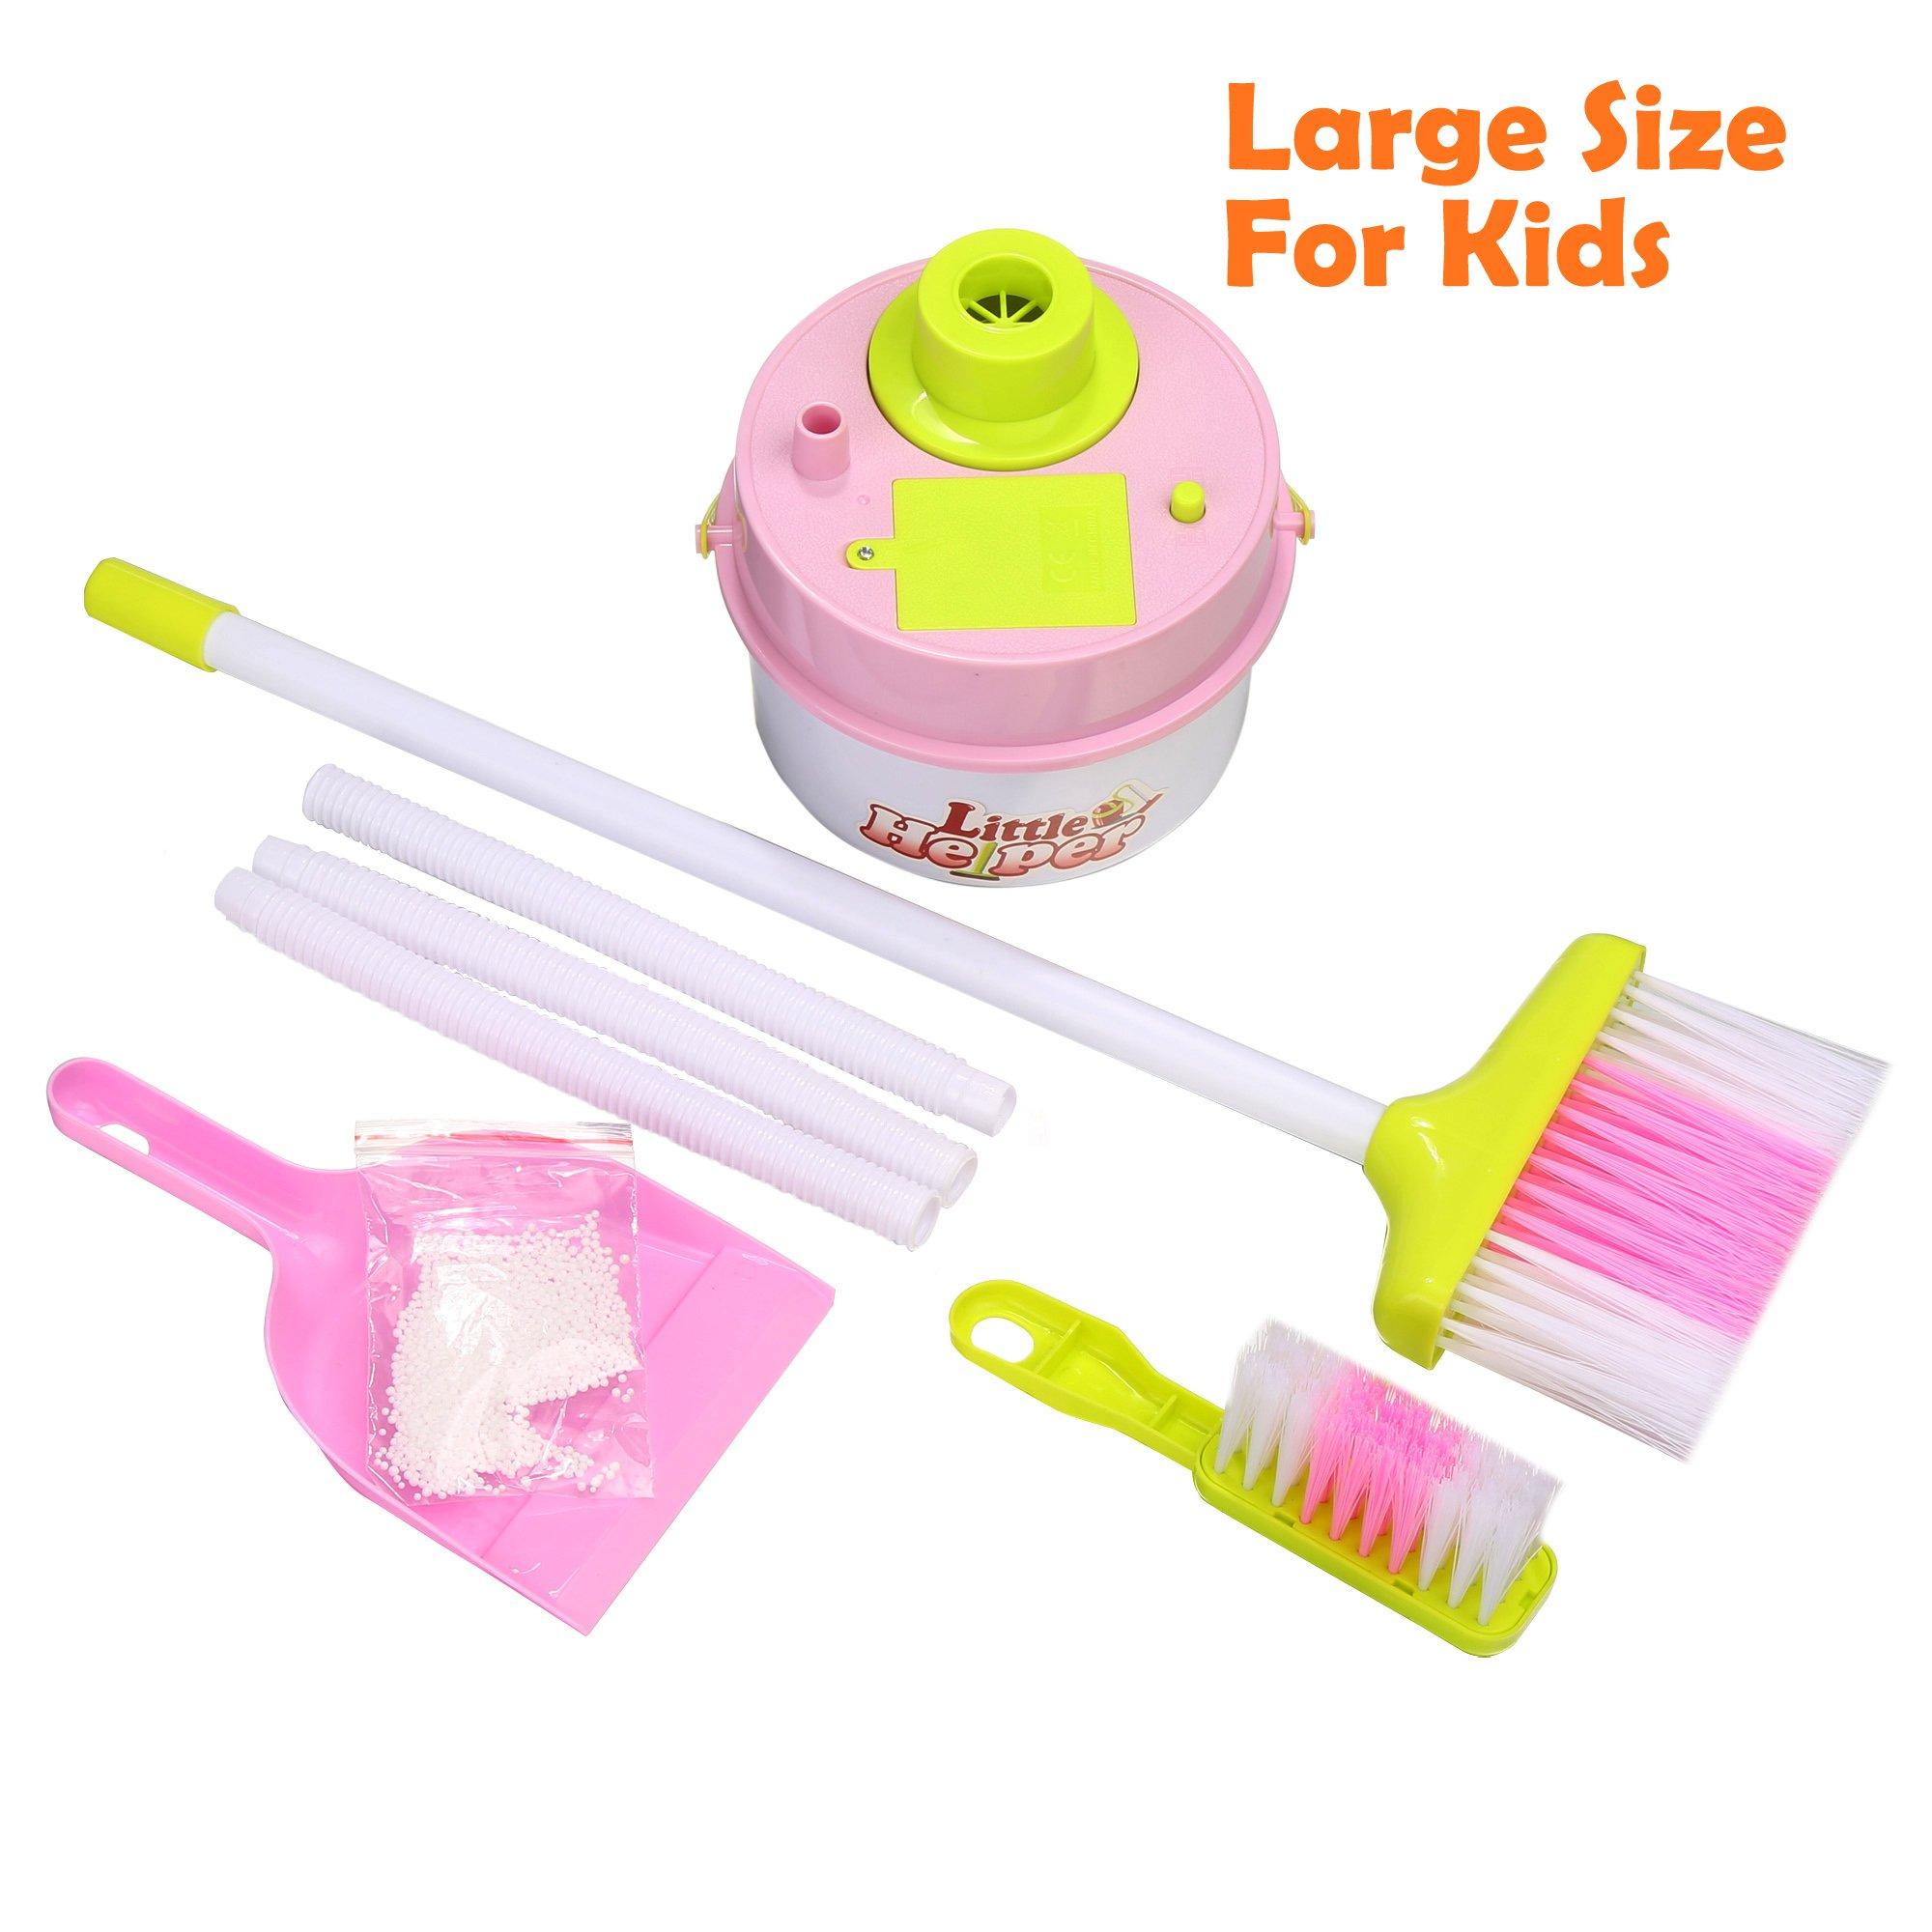 (US Stock) Arshiner Toddlers Kids Mini Housekeeping Cleaning Supplies Pretend Play Toys Set Broom/Brush/Dust Pan/Little helper